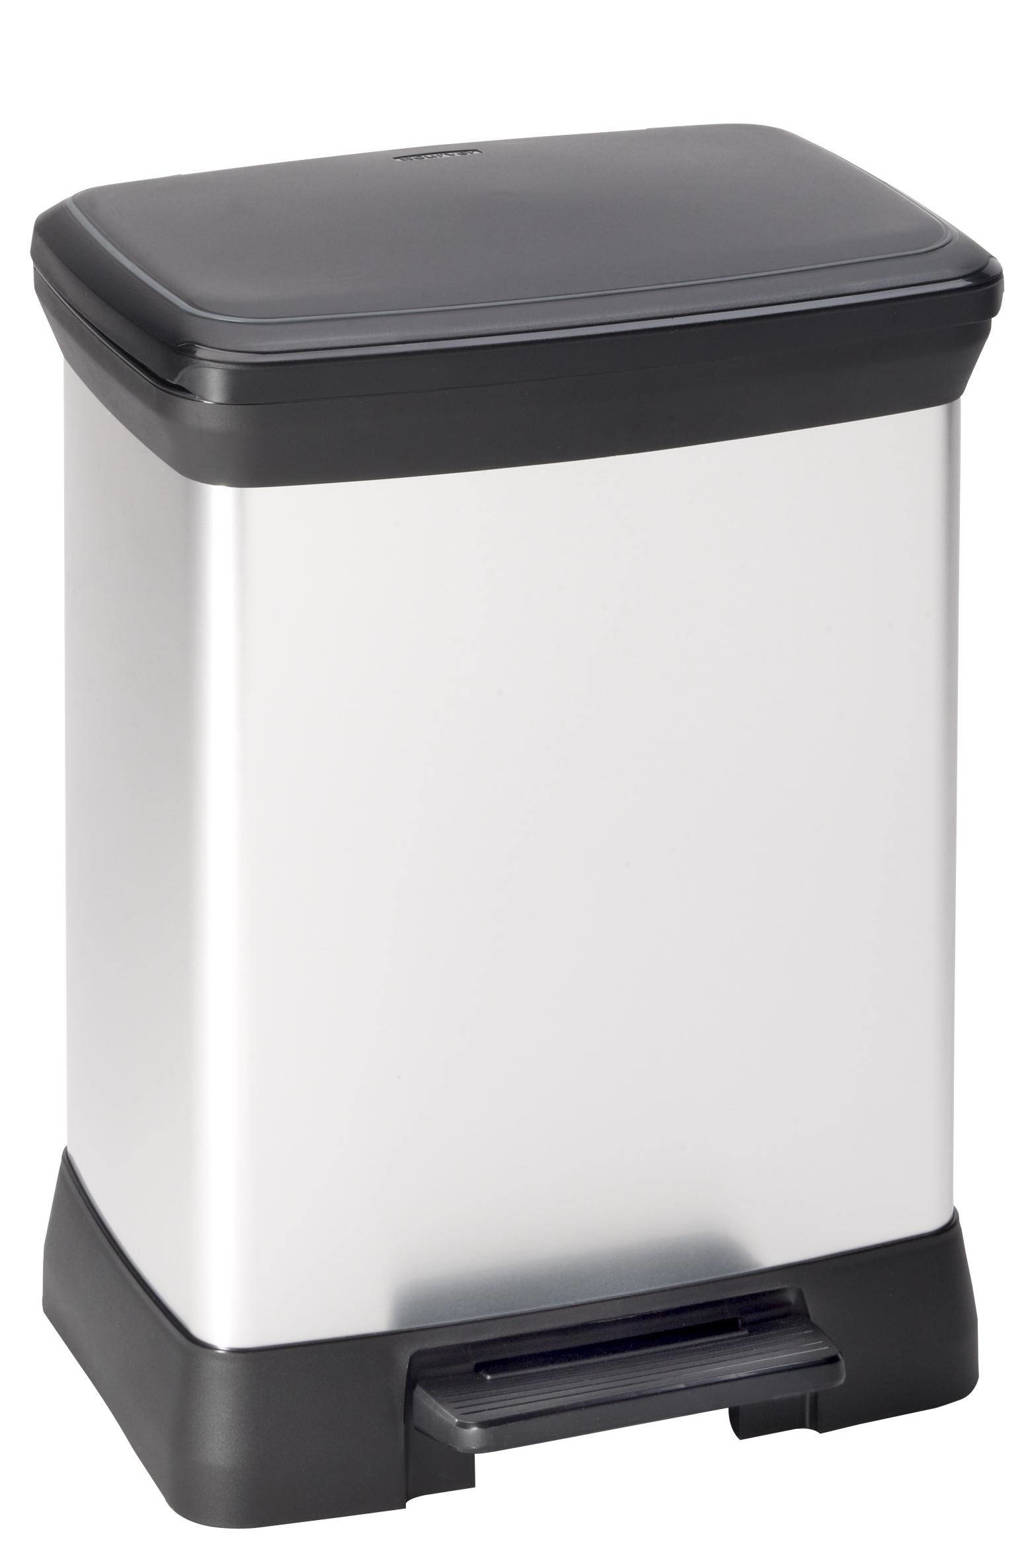 Curver Decobin 30 liter afvalbak Decobin (30 L), Metallic